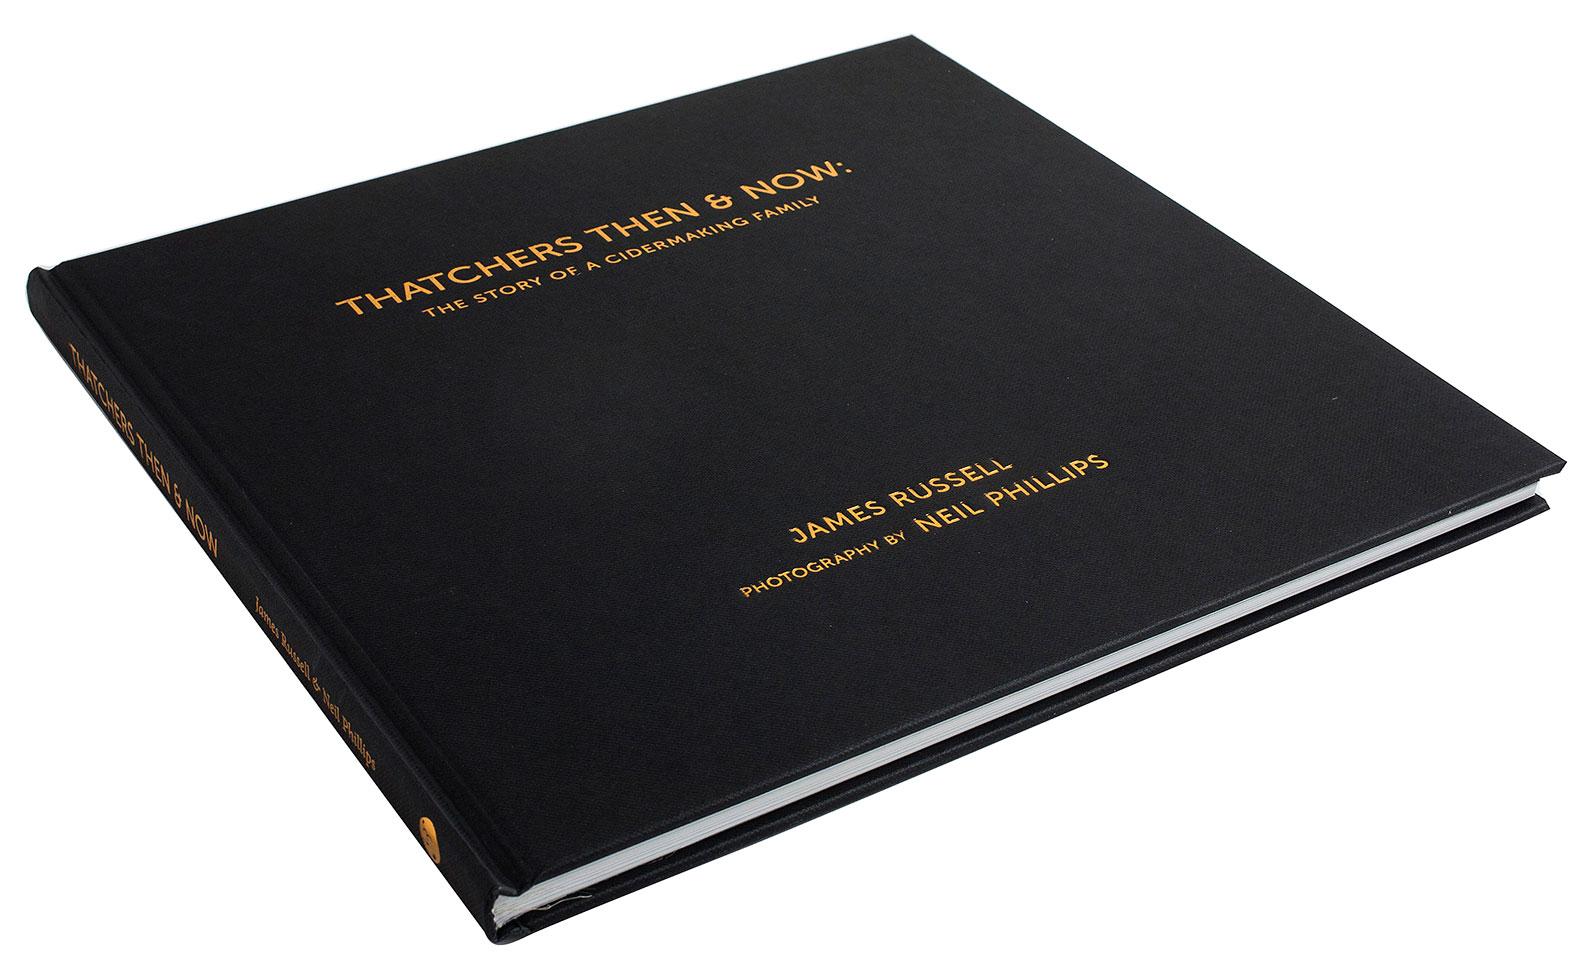 epm-print-management-bristol-food-books-thatchers-2.jpg